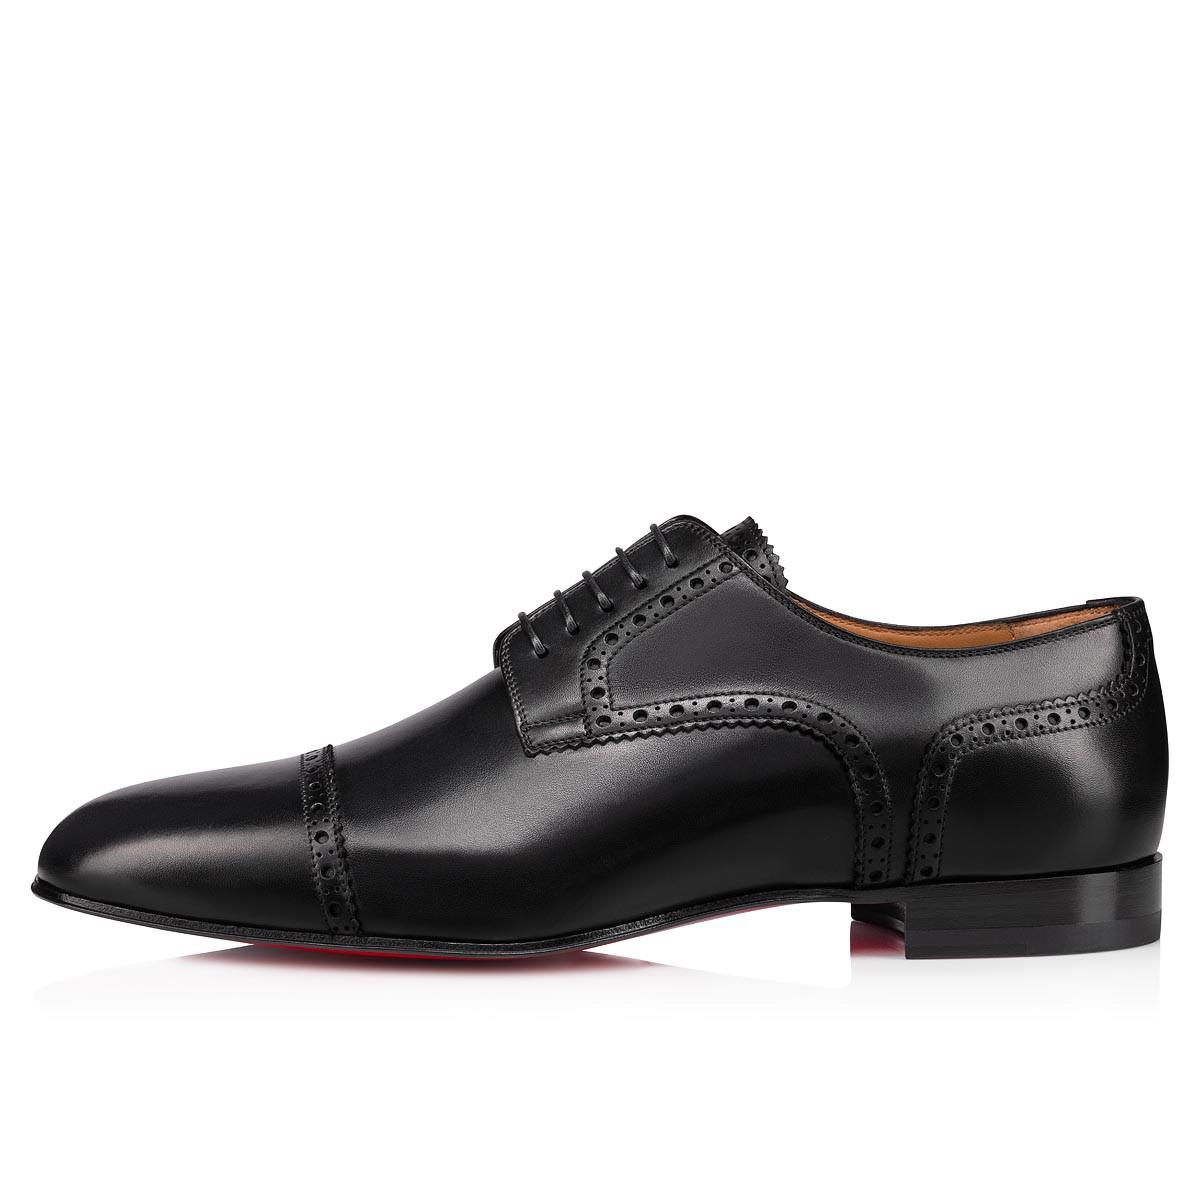 Shoes - Eygeny Flat - Christian Louboutin